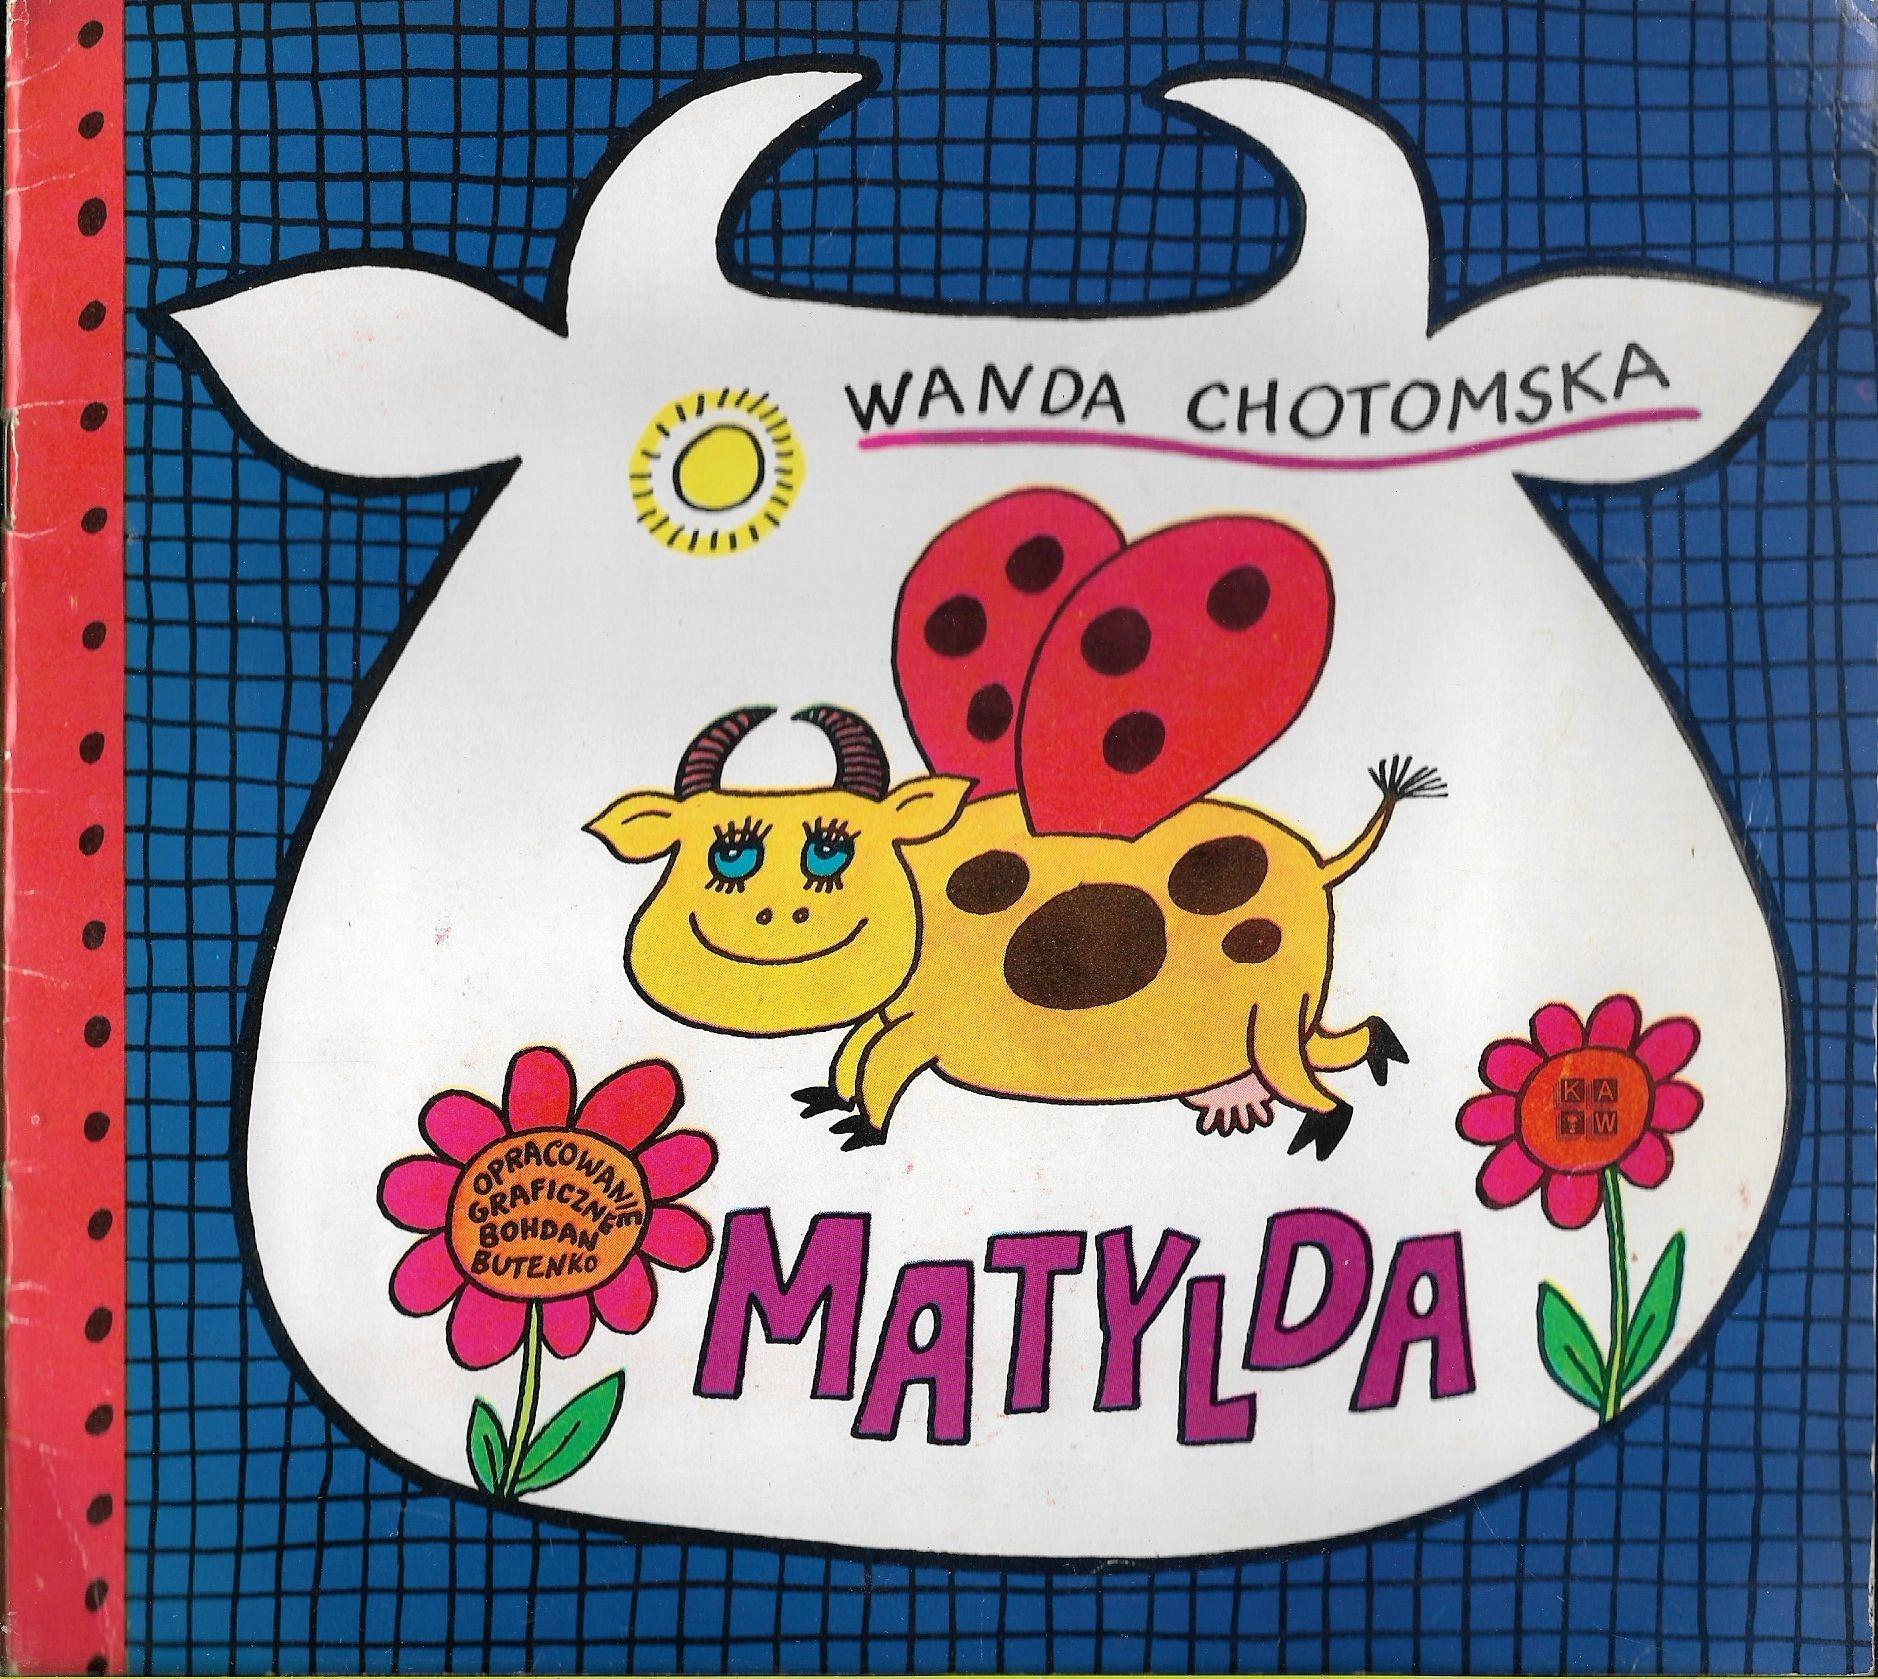 Matylda Wchotomska Ilbbutenko Stan Bdb 7665170427